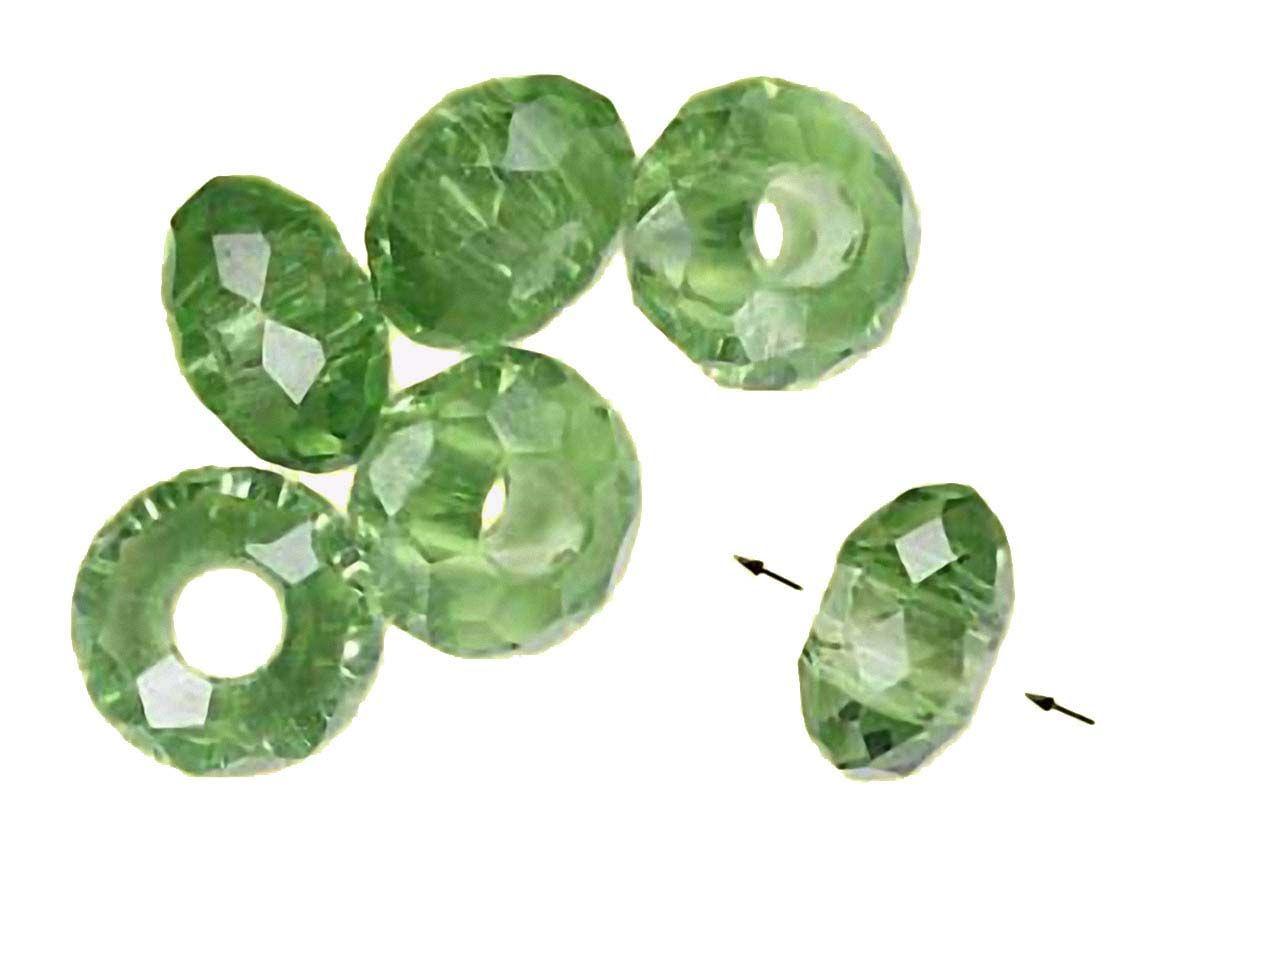 Magic and Arts Grossloch Perlen Kristallglas Saphir